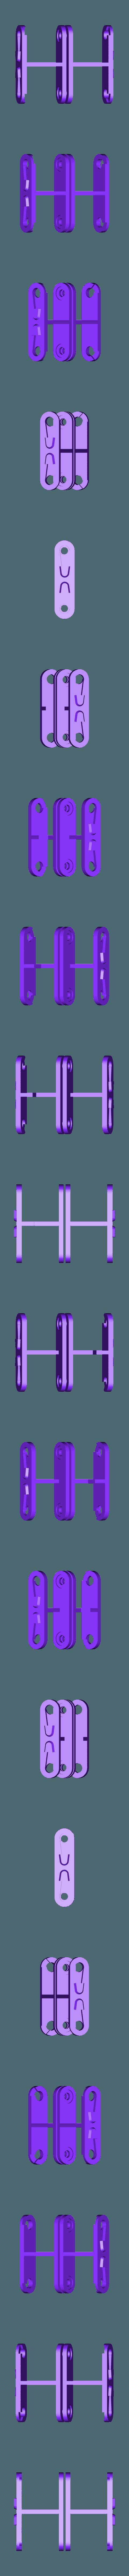 m-femur.stl Download free STL file Ez Arduino Spidey - 12 DOF Quadruped Robot • 3D printing object, manic-3d-print